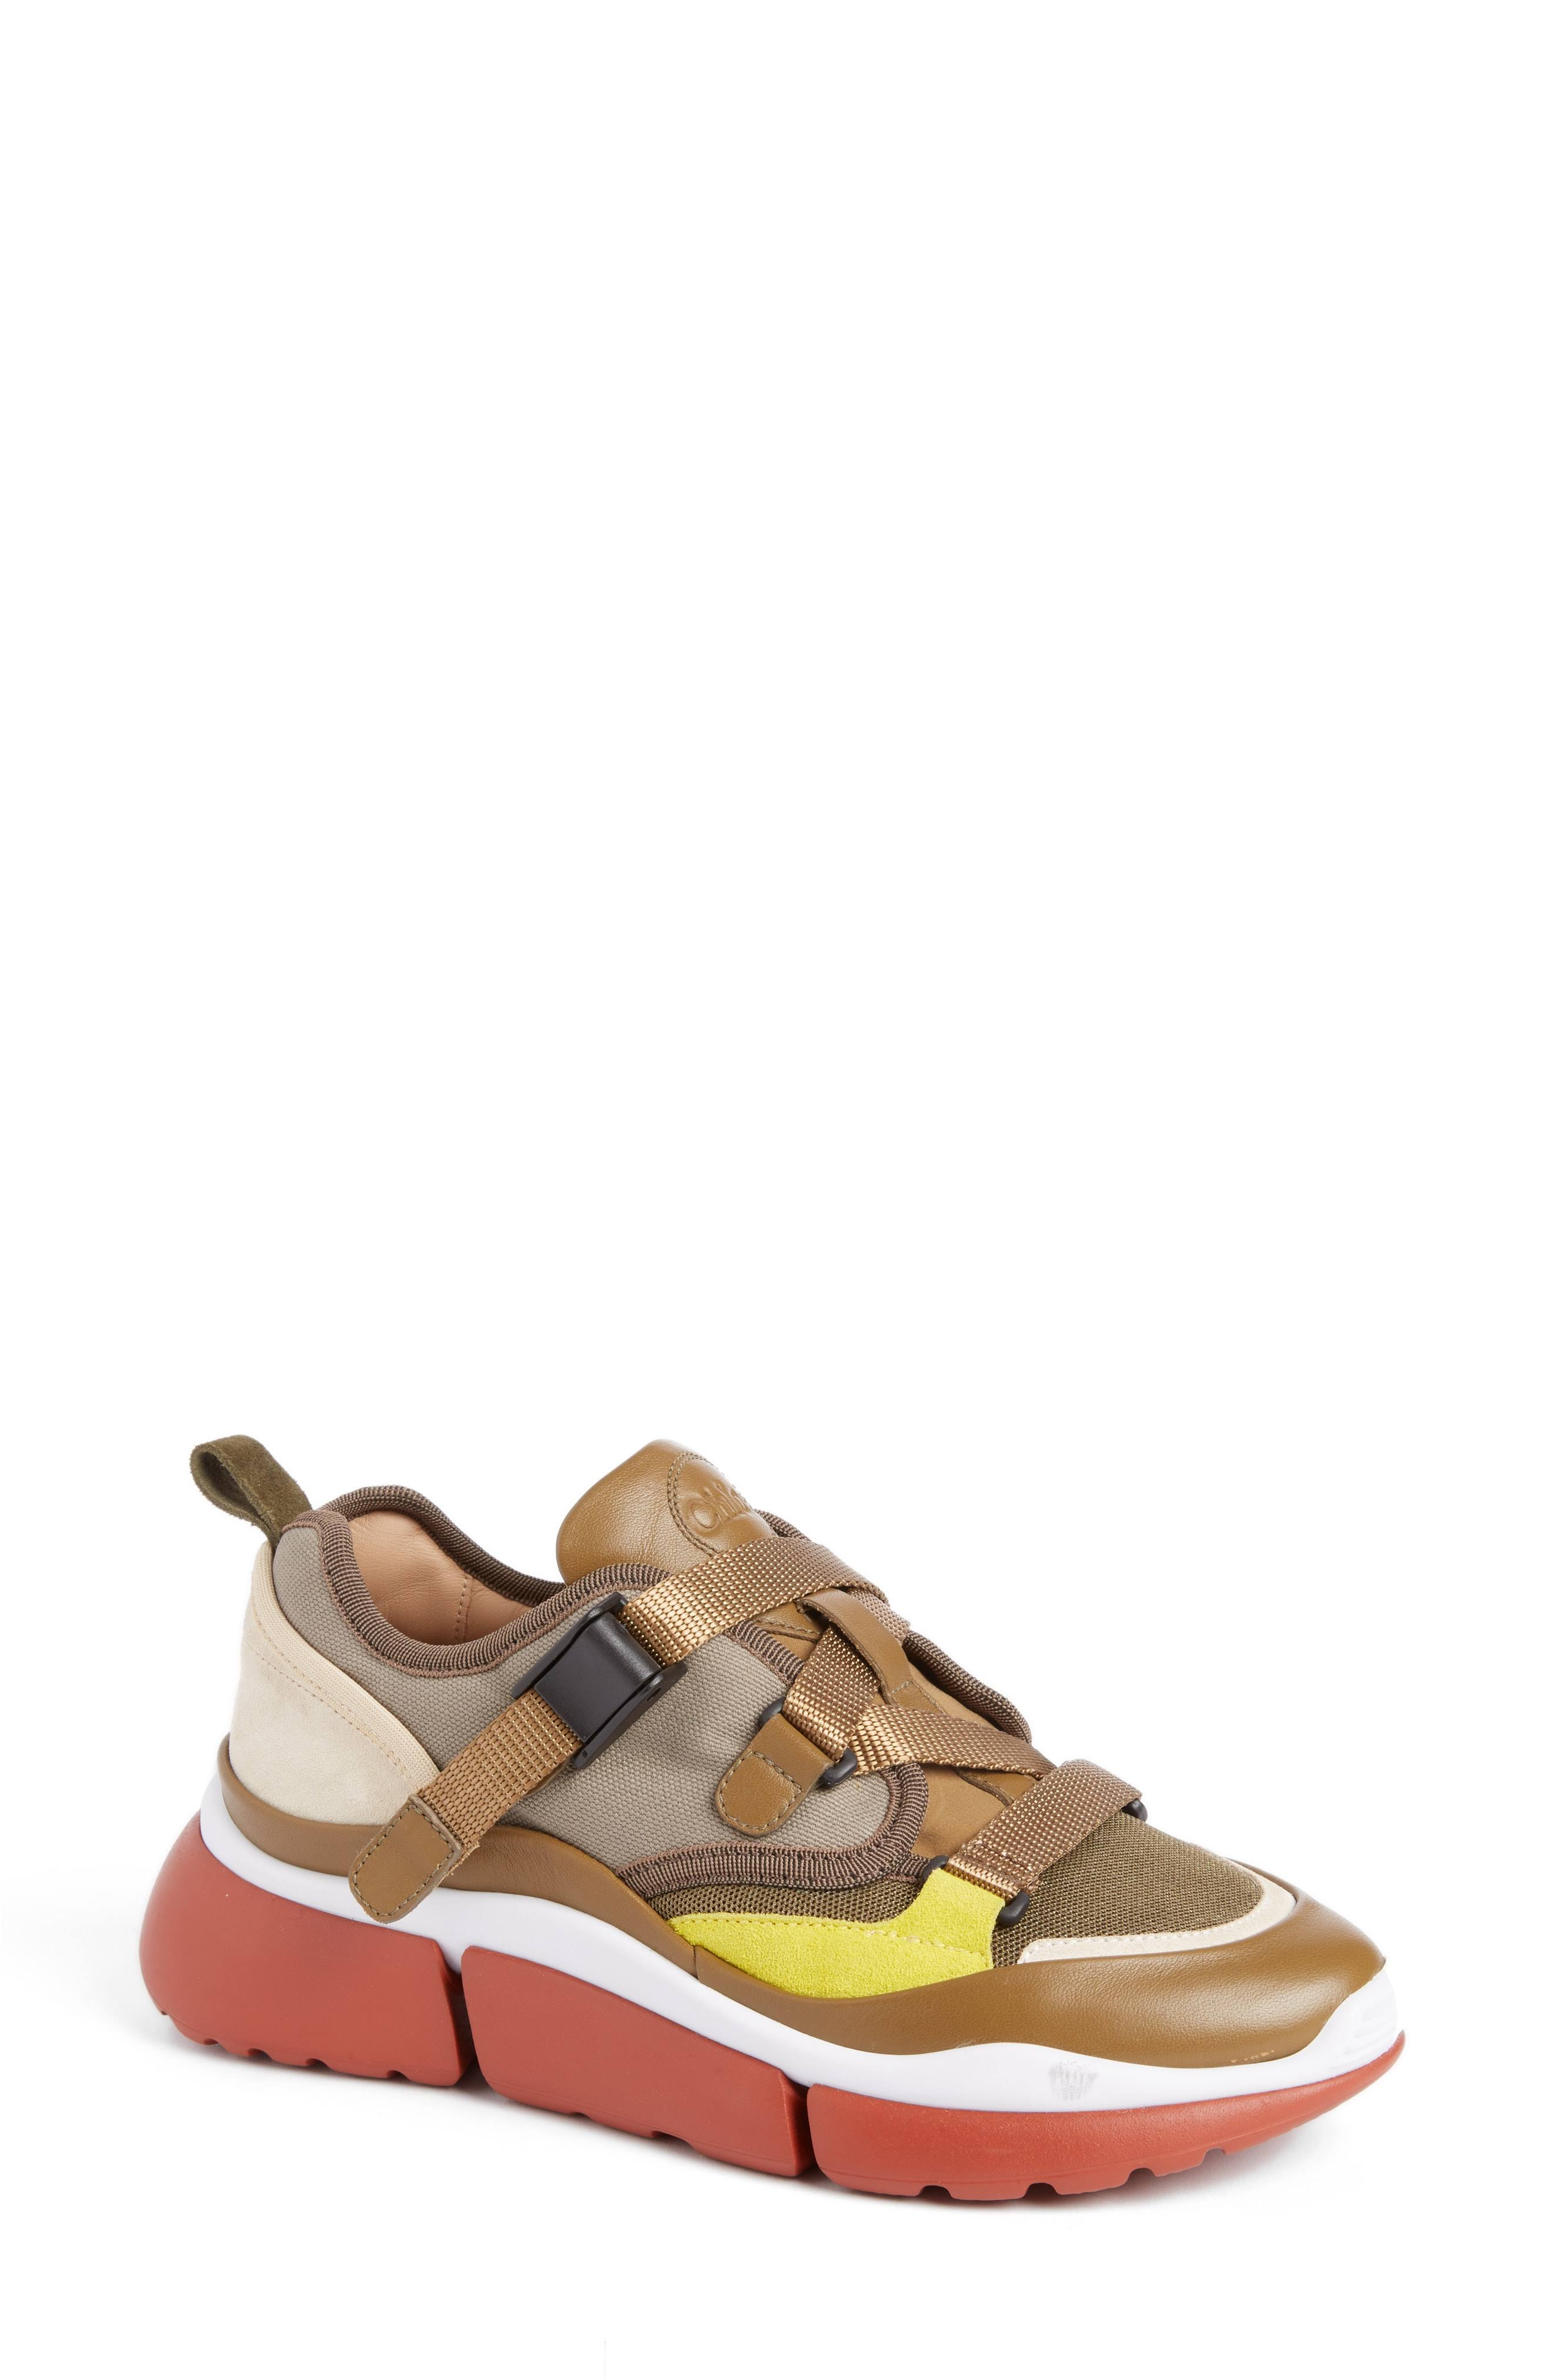 Becerro Nylon Para Khaki Sneaker 4 5 Algodón Poliéster 1 Sooty De top Talla Piel Sonnie Low Chloé 30 Elastano 40 Mujer 25 YHwOqO